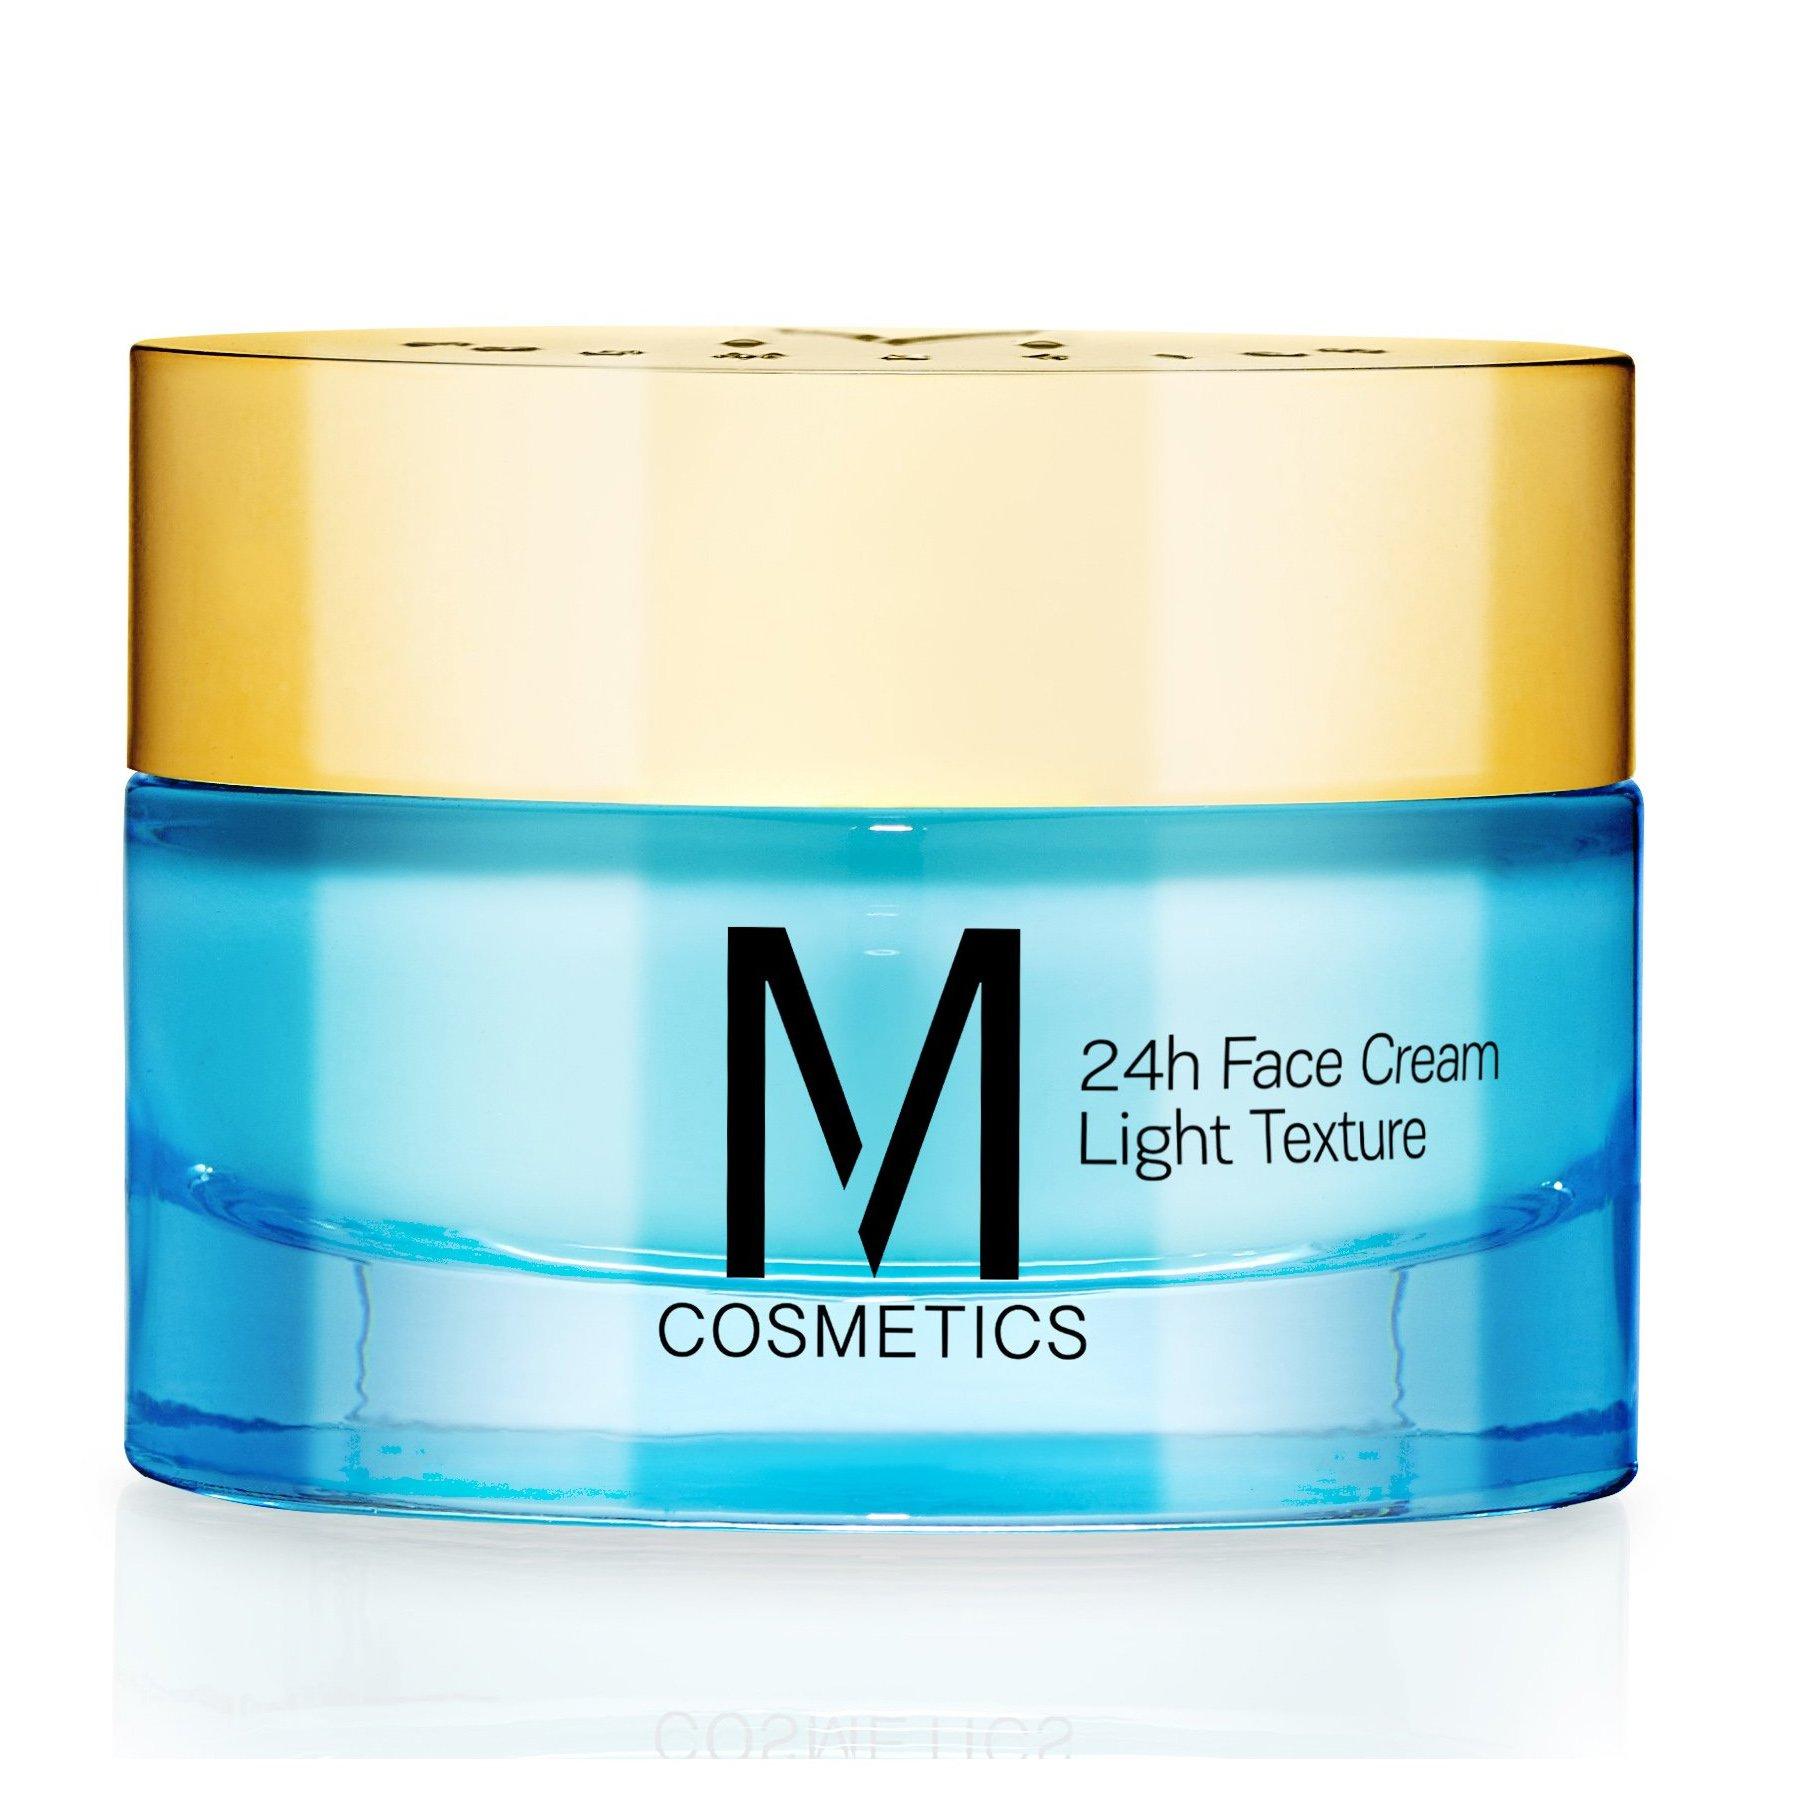 M Cosmetis 24h Face Cream Light Texture 24ωρη Κρέμα Προσώπου Ελαφριάς Υφής με Ολοκληρωμένη Αντιρυτιδική & Συσφικτική Δράση 50ml